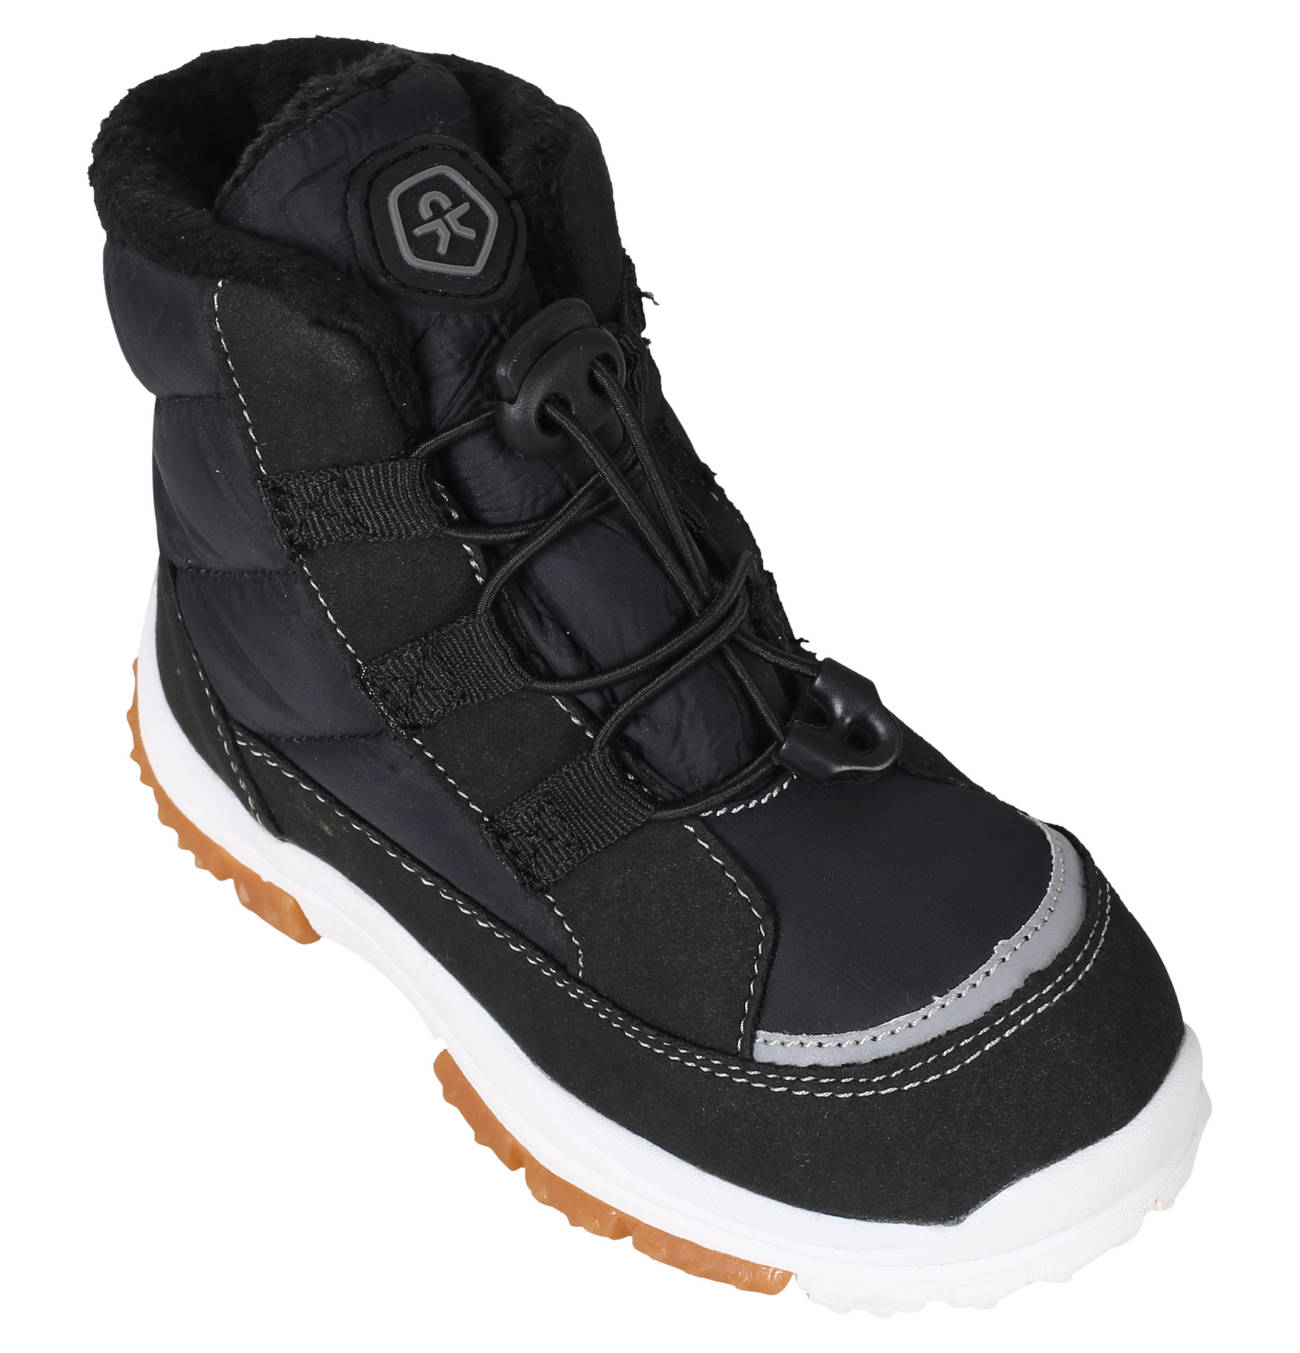 Outdoor Schuhe: Stiefel & Walkingschuhe   GALERIA Karstadt